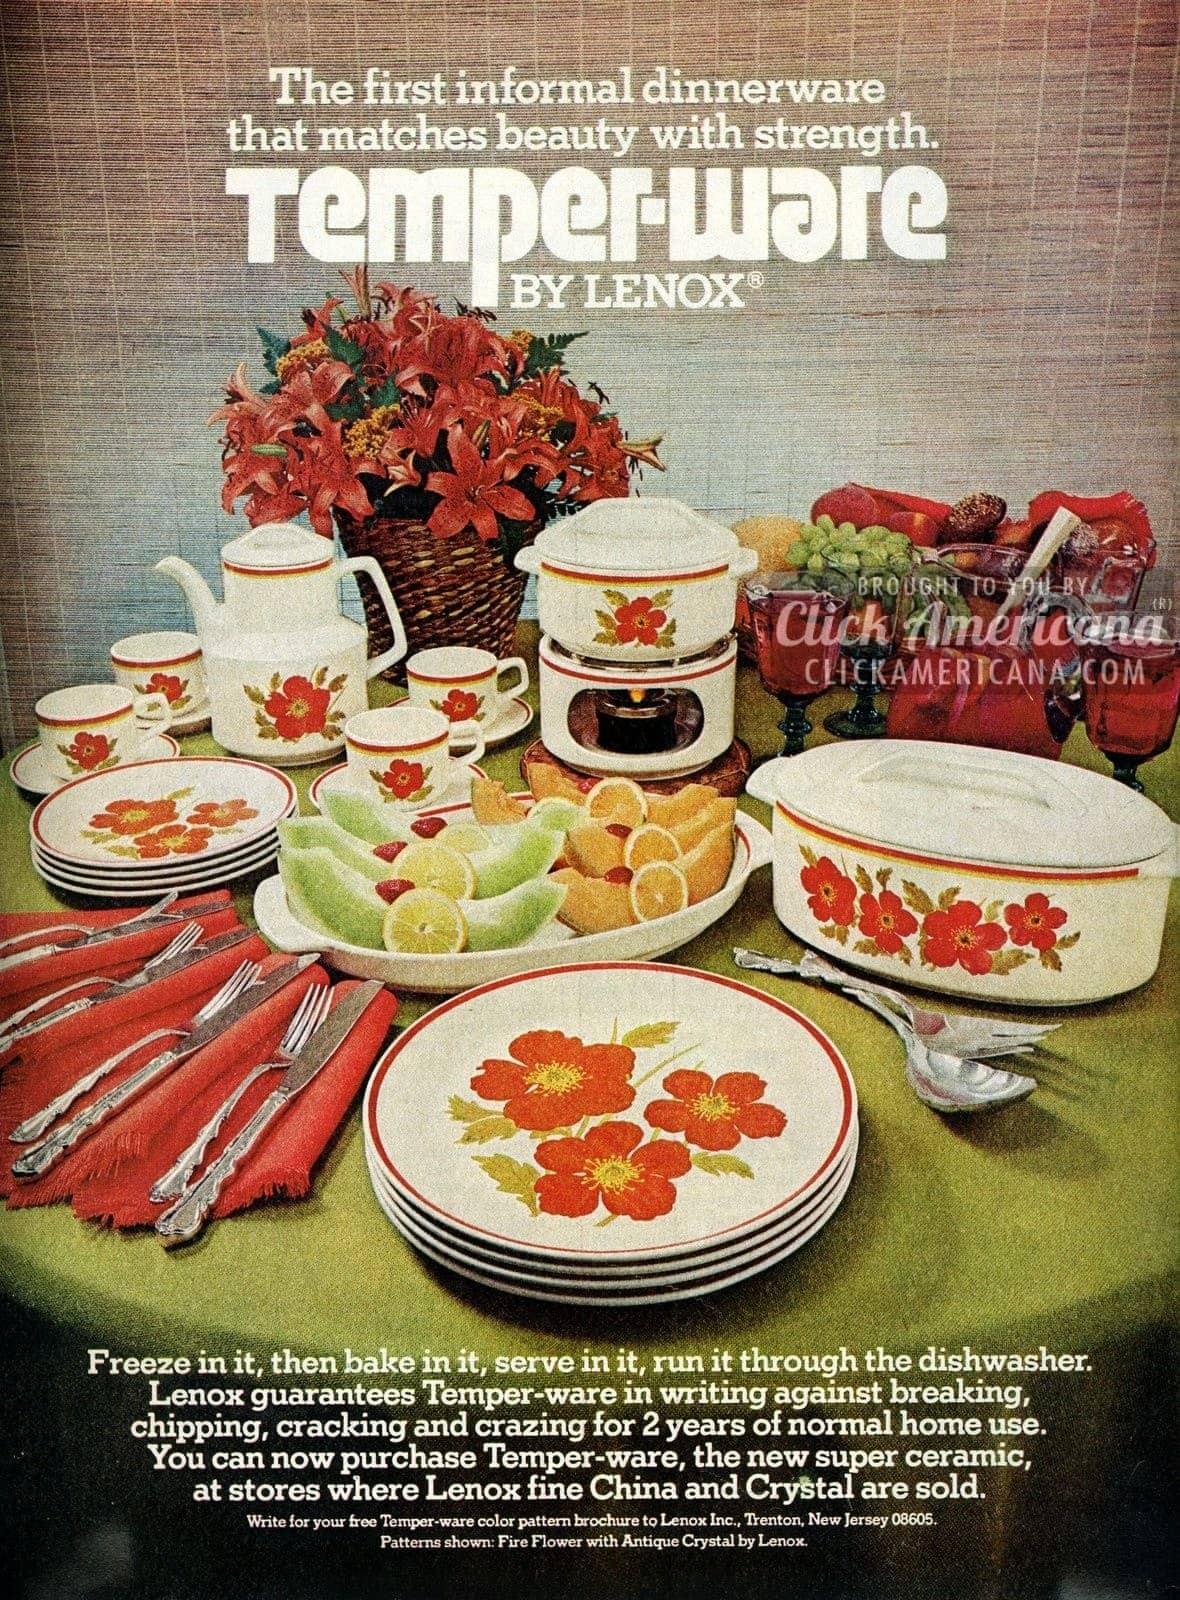 lenox-temperware-dishes-vintage-aug-1976